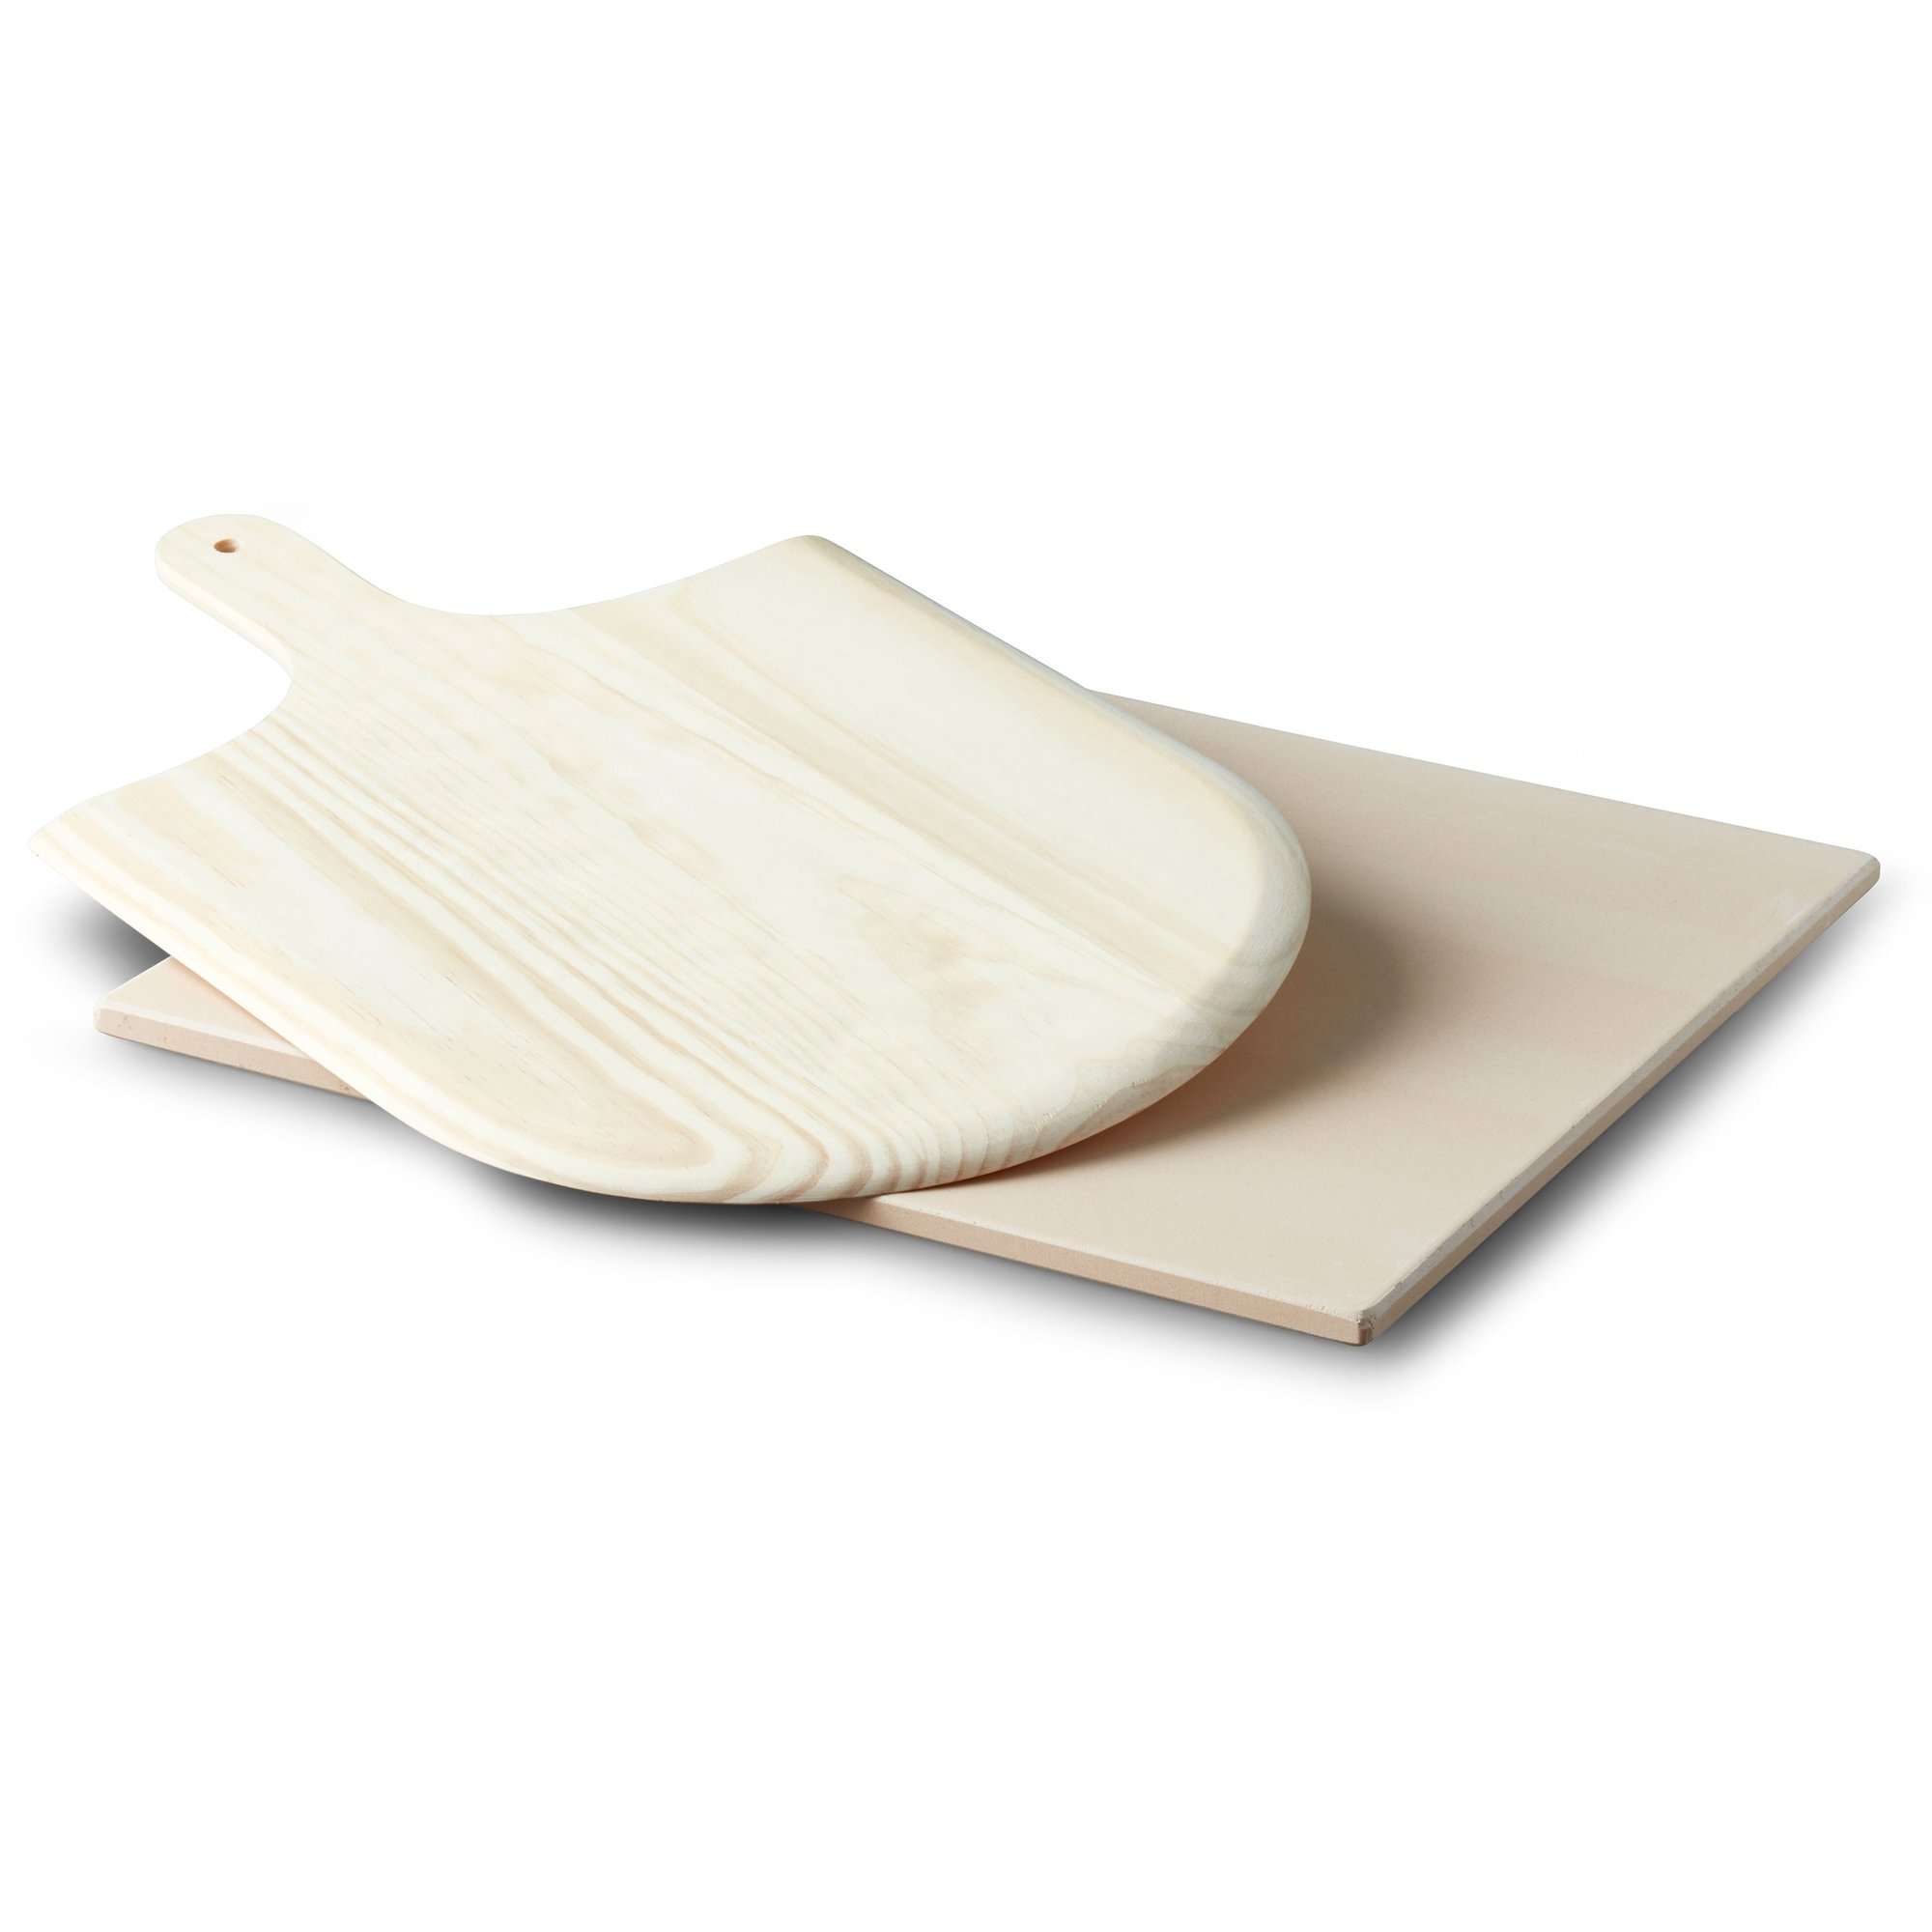 Funktion Pizzasten med spade 38×355 cm.